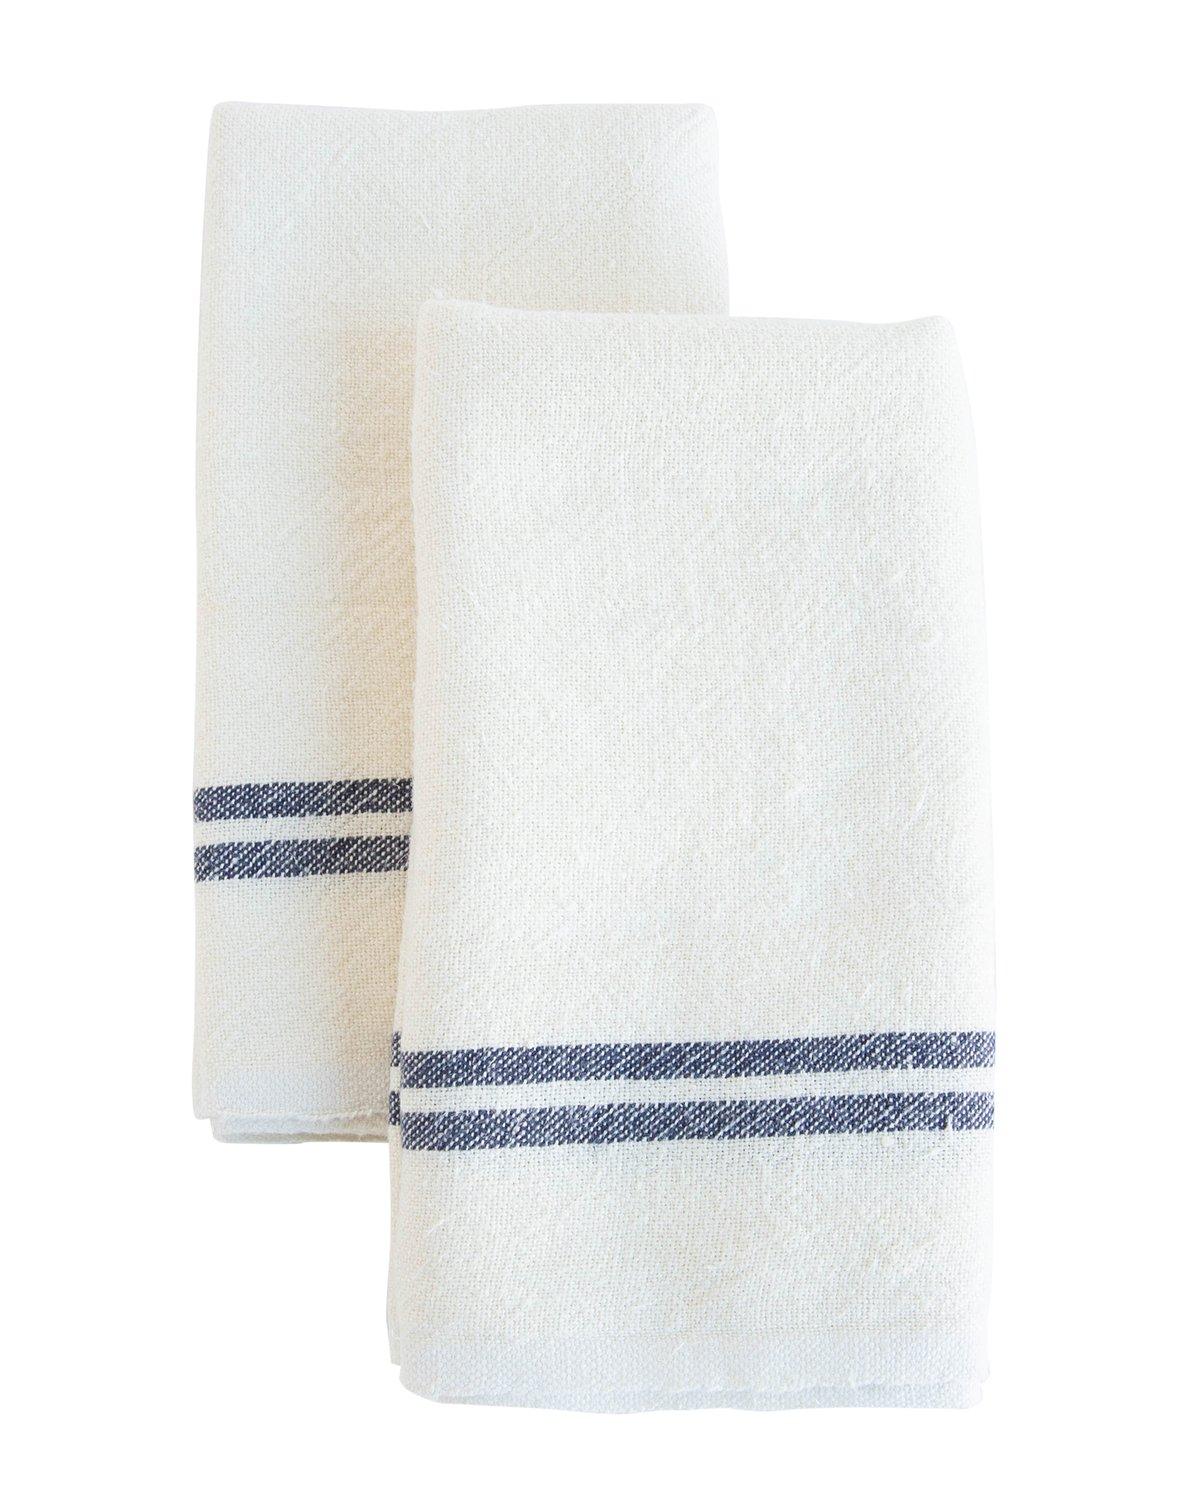 Townsend_Hand_Towels_1.jpg